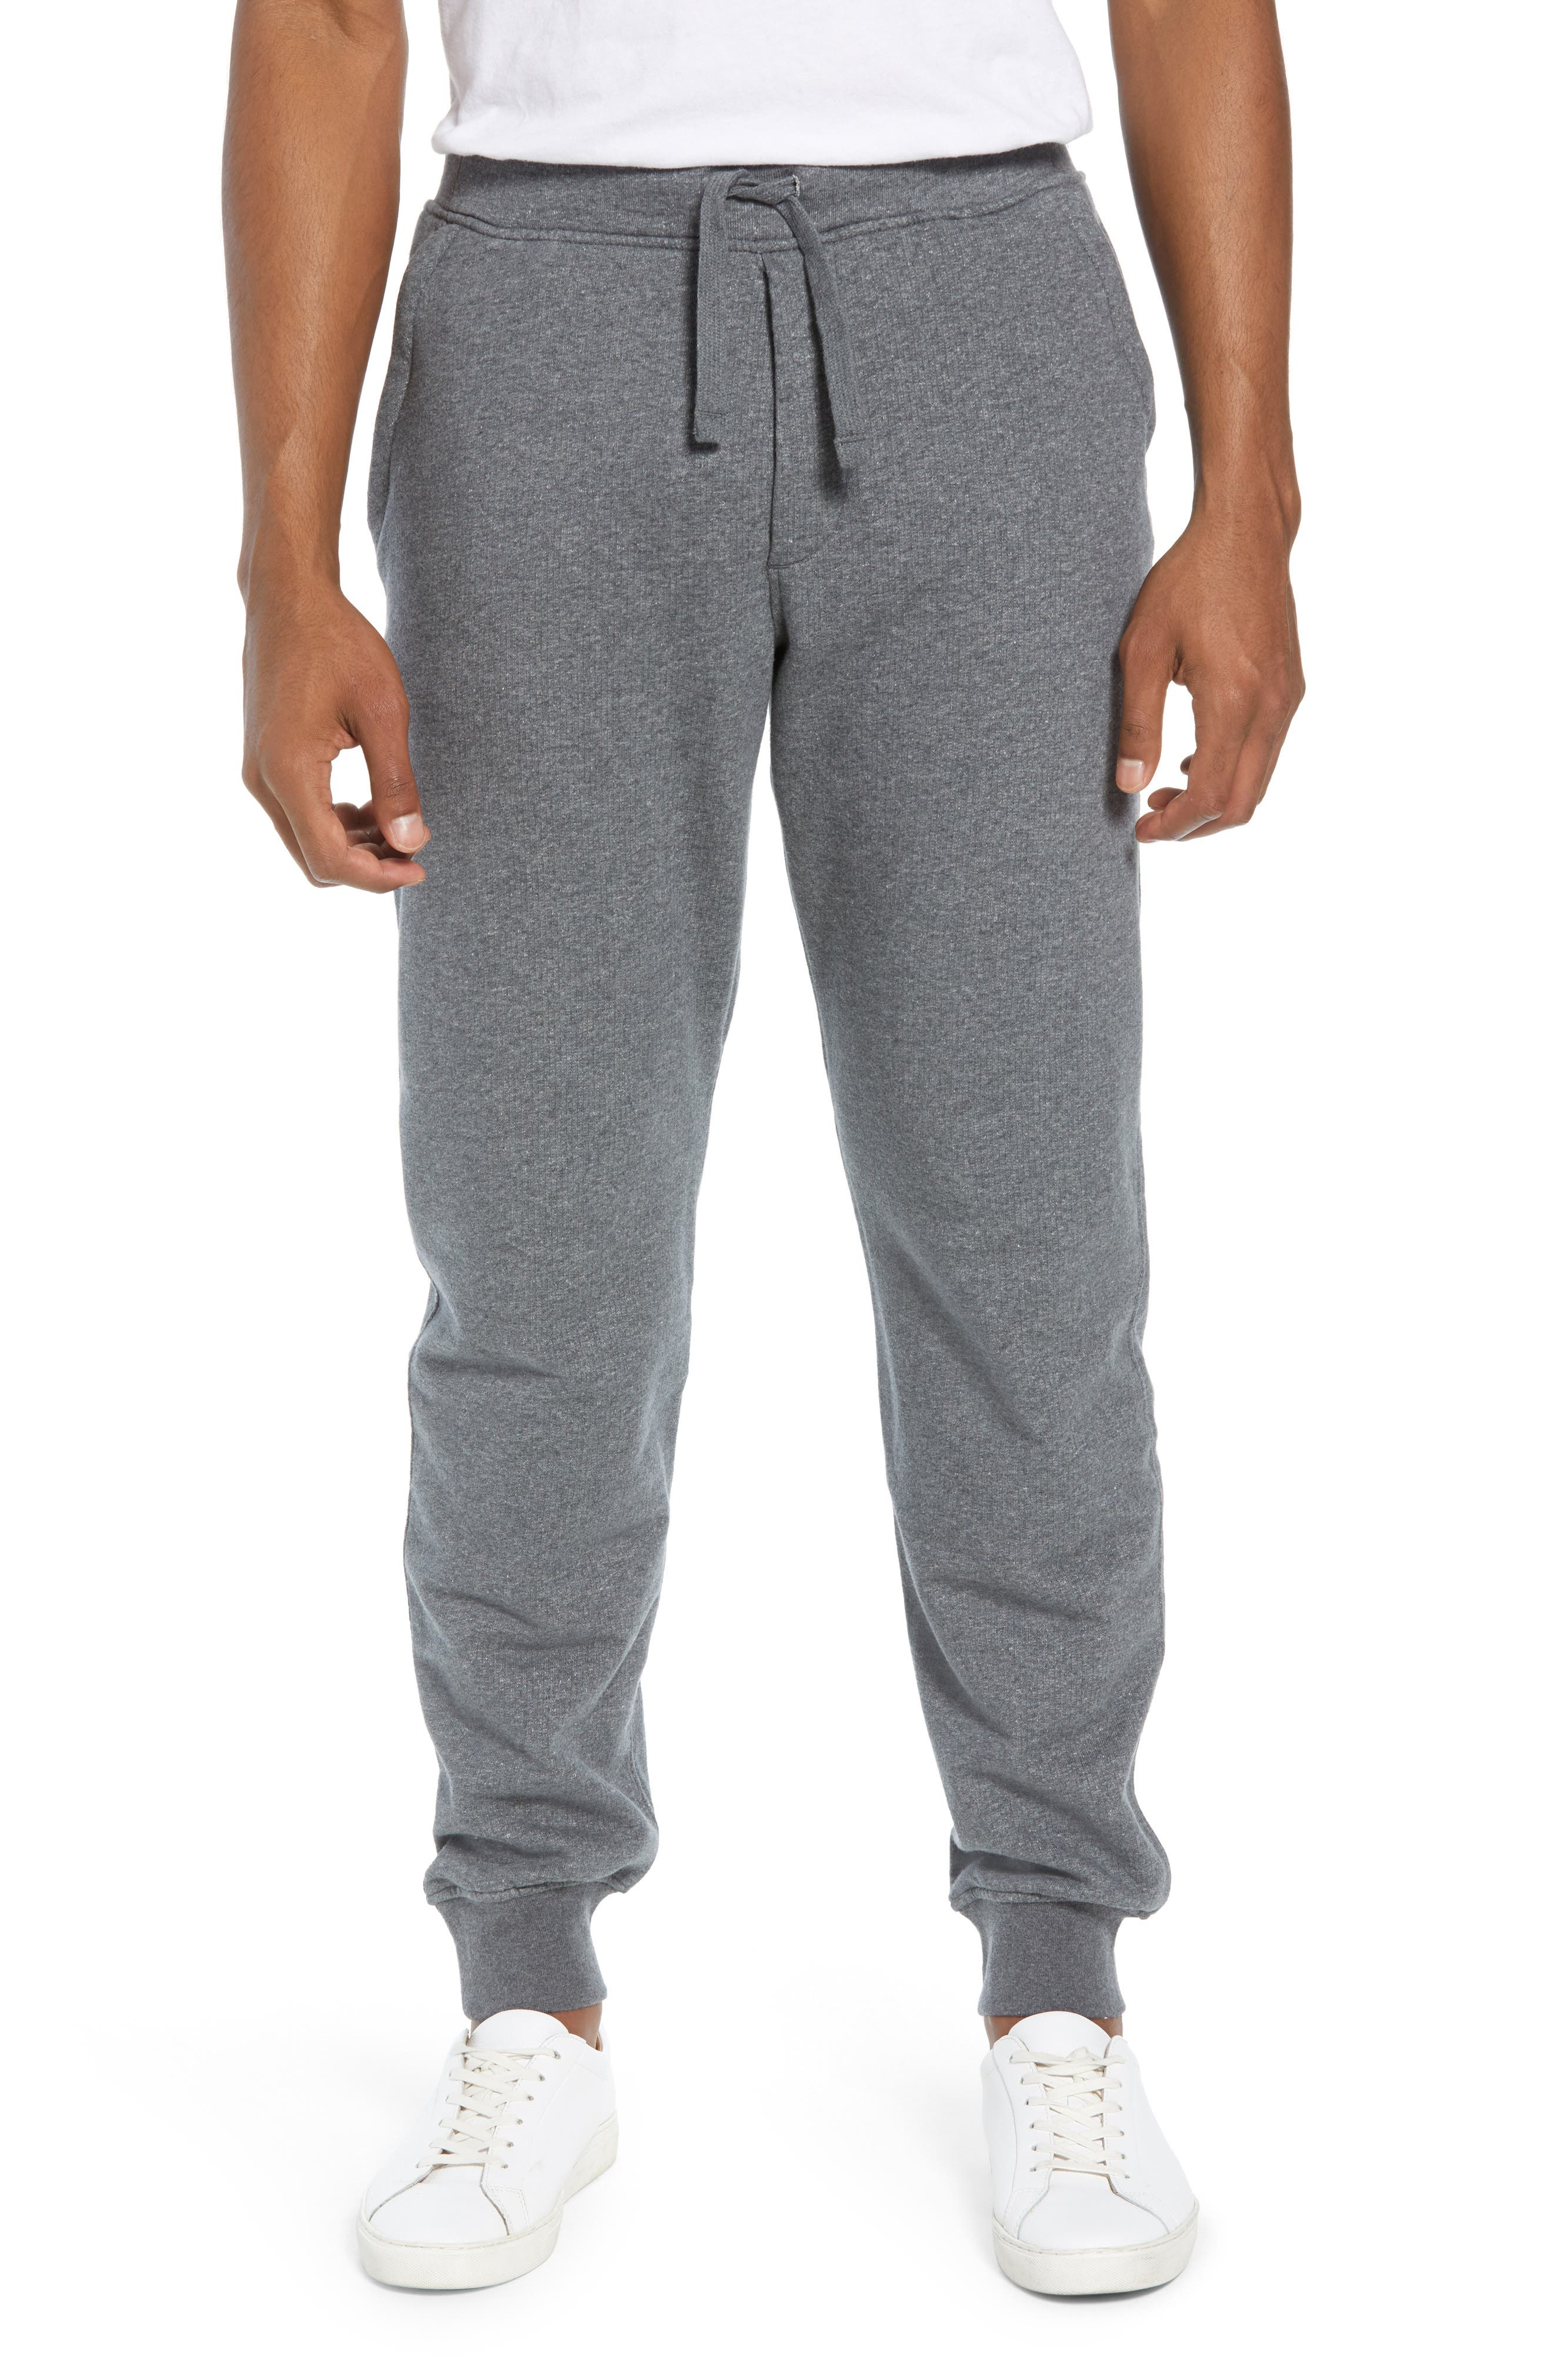 PATAGONIA Mahnya Fleece Jogger Pants, Main, color, FORGE GREY